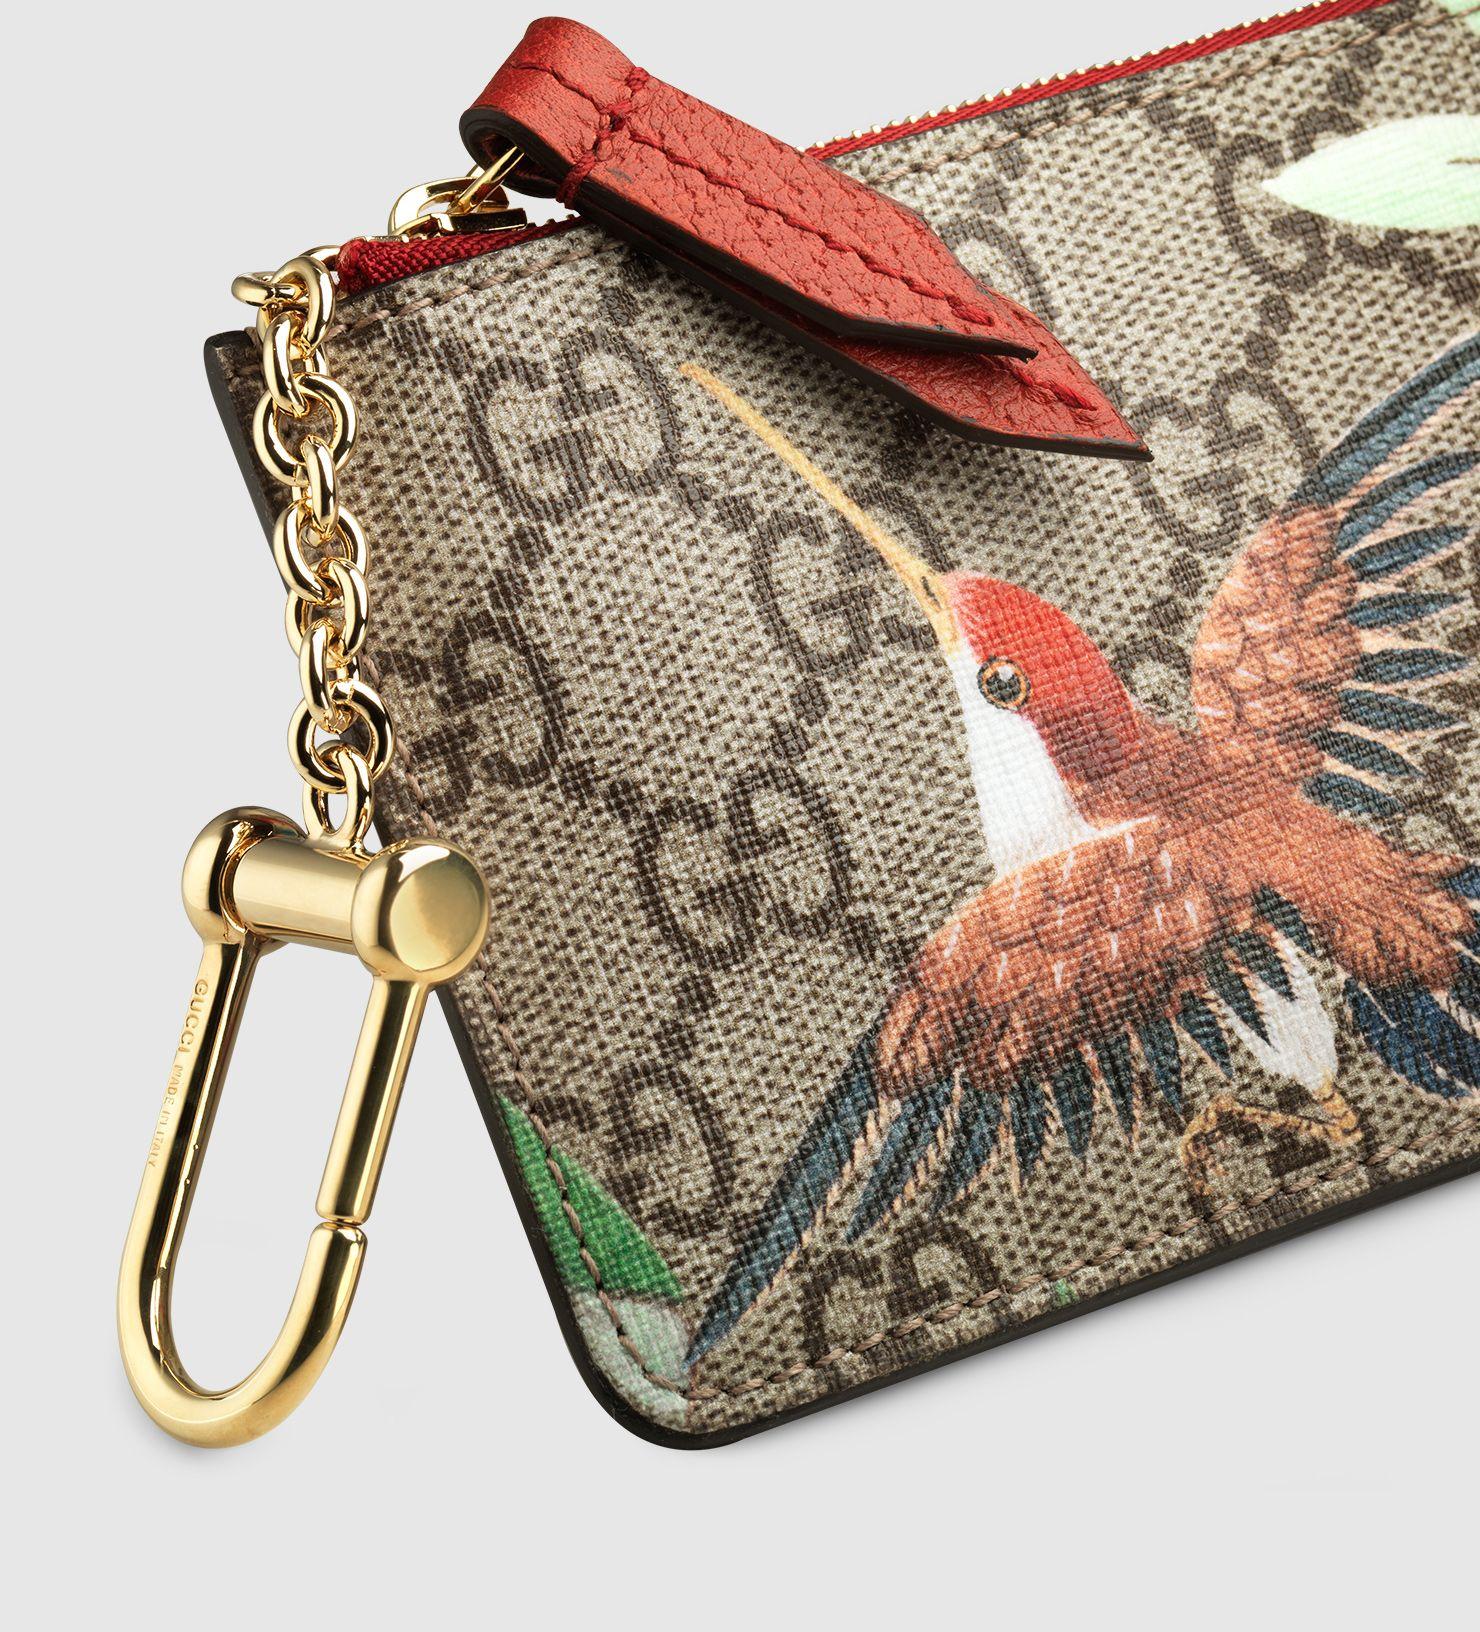 44a83fd6f Gucci Tian GG Supreme key case   SLGs   Key case, Chinese landscape ...